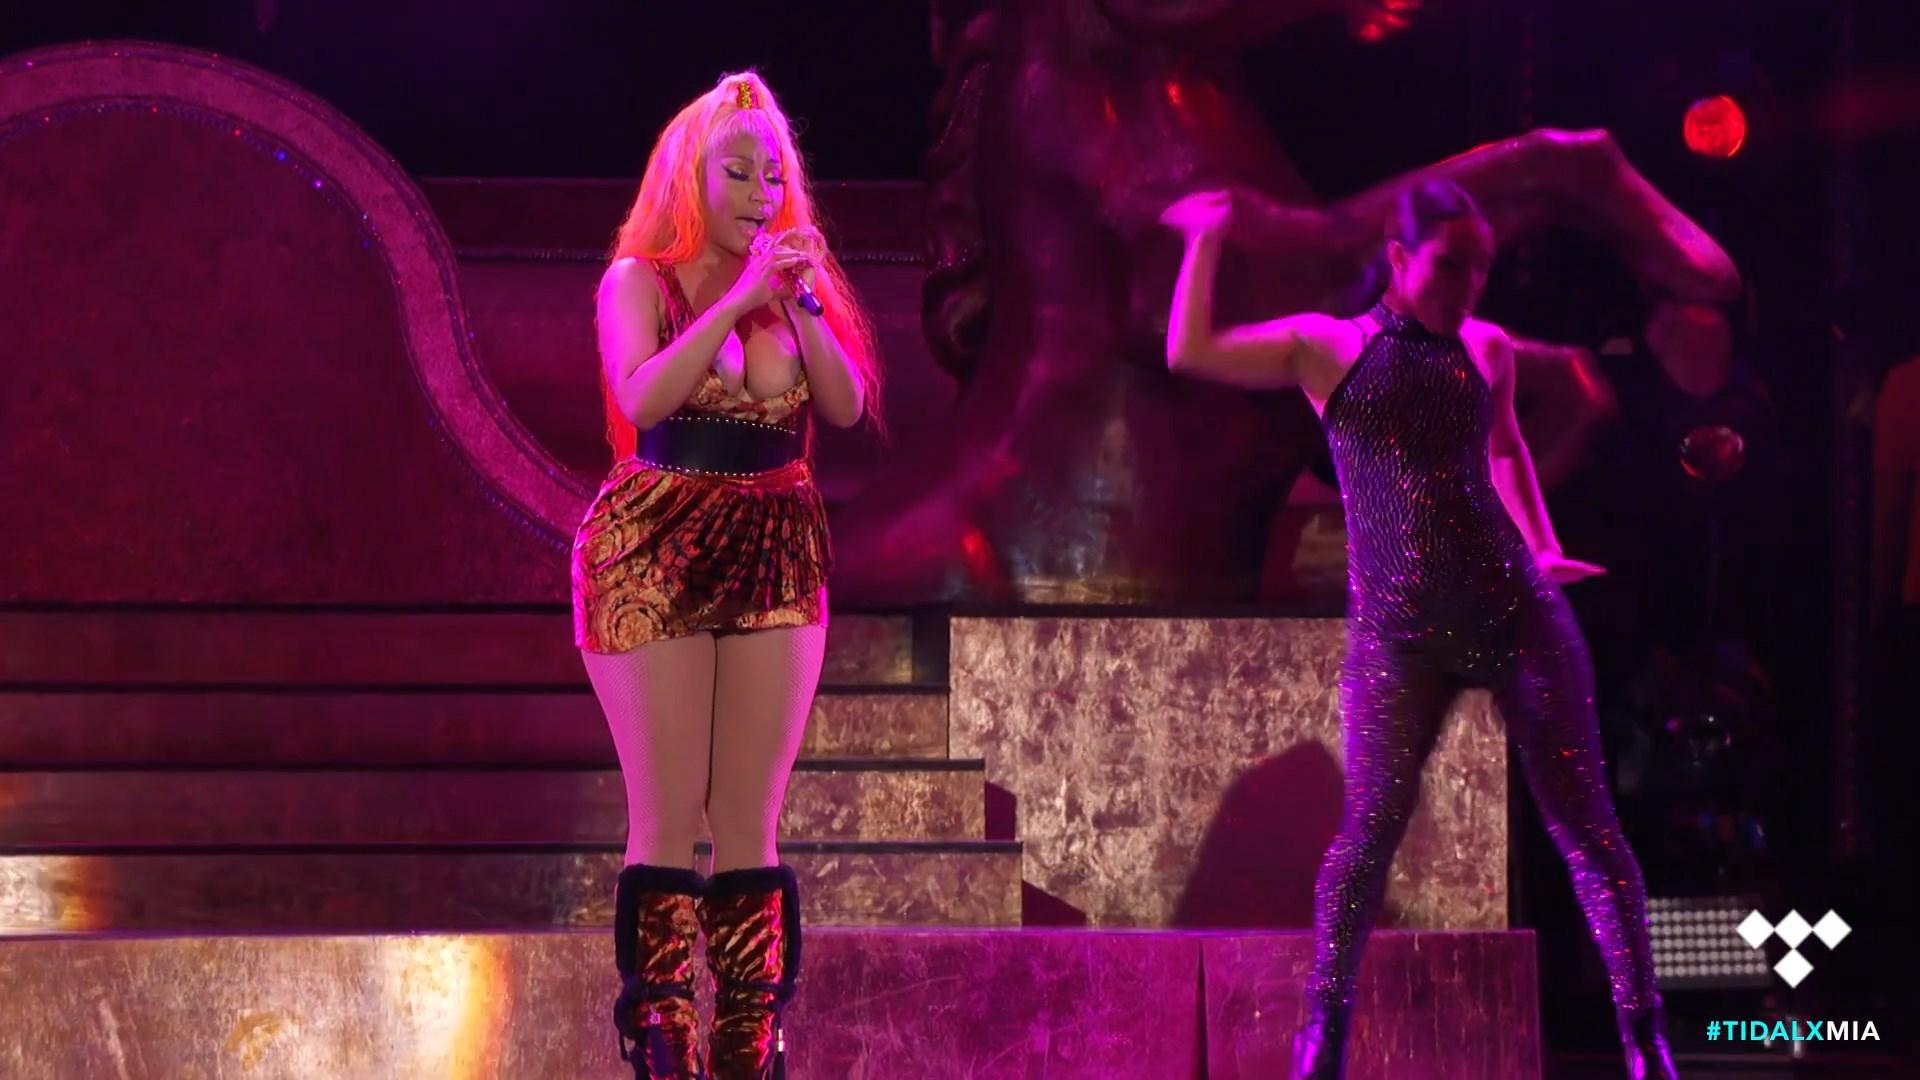 Nicki-Minaj-Nude-TheFappeningBlog.com-27.jpg